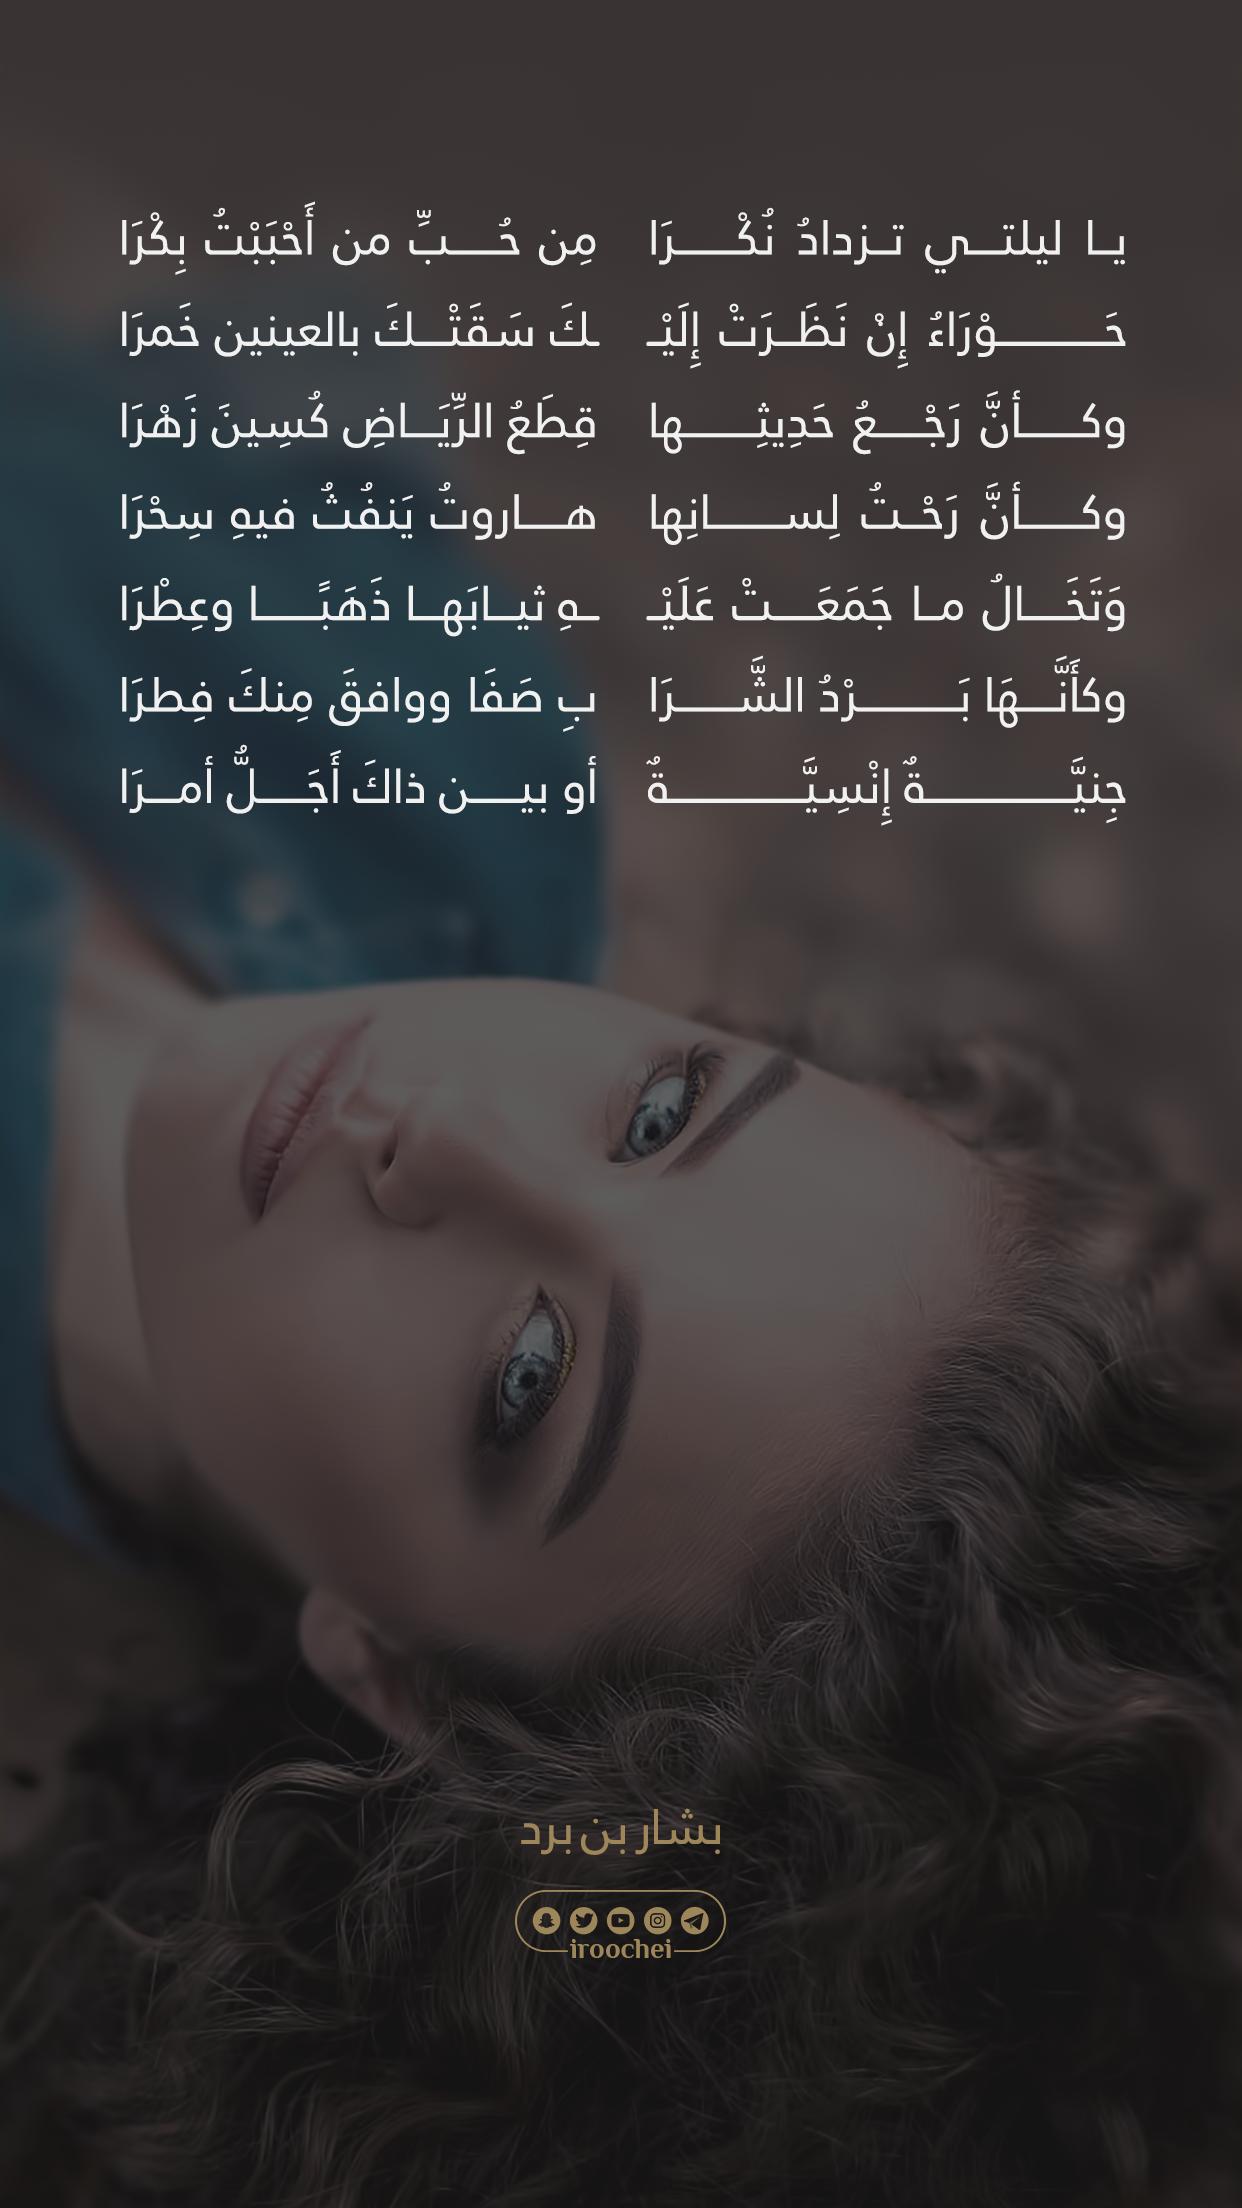 يا ليلتي تزداد نكرا Wisdom Quotes Life Beautiful Arabic Words Words Quotes